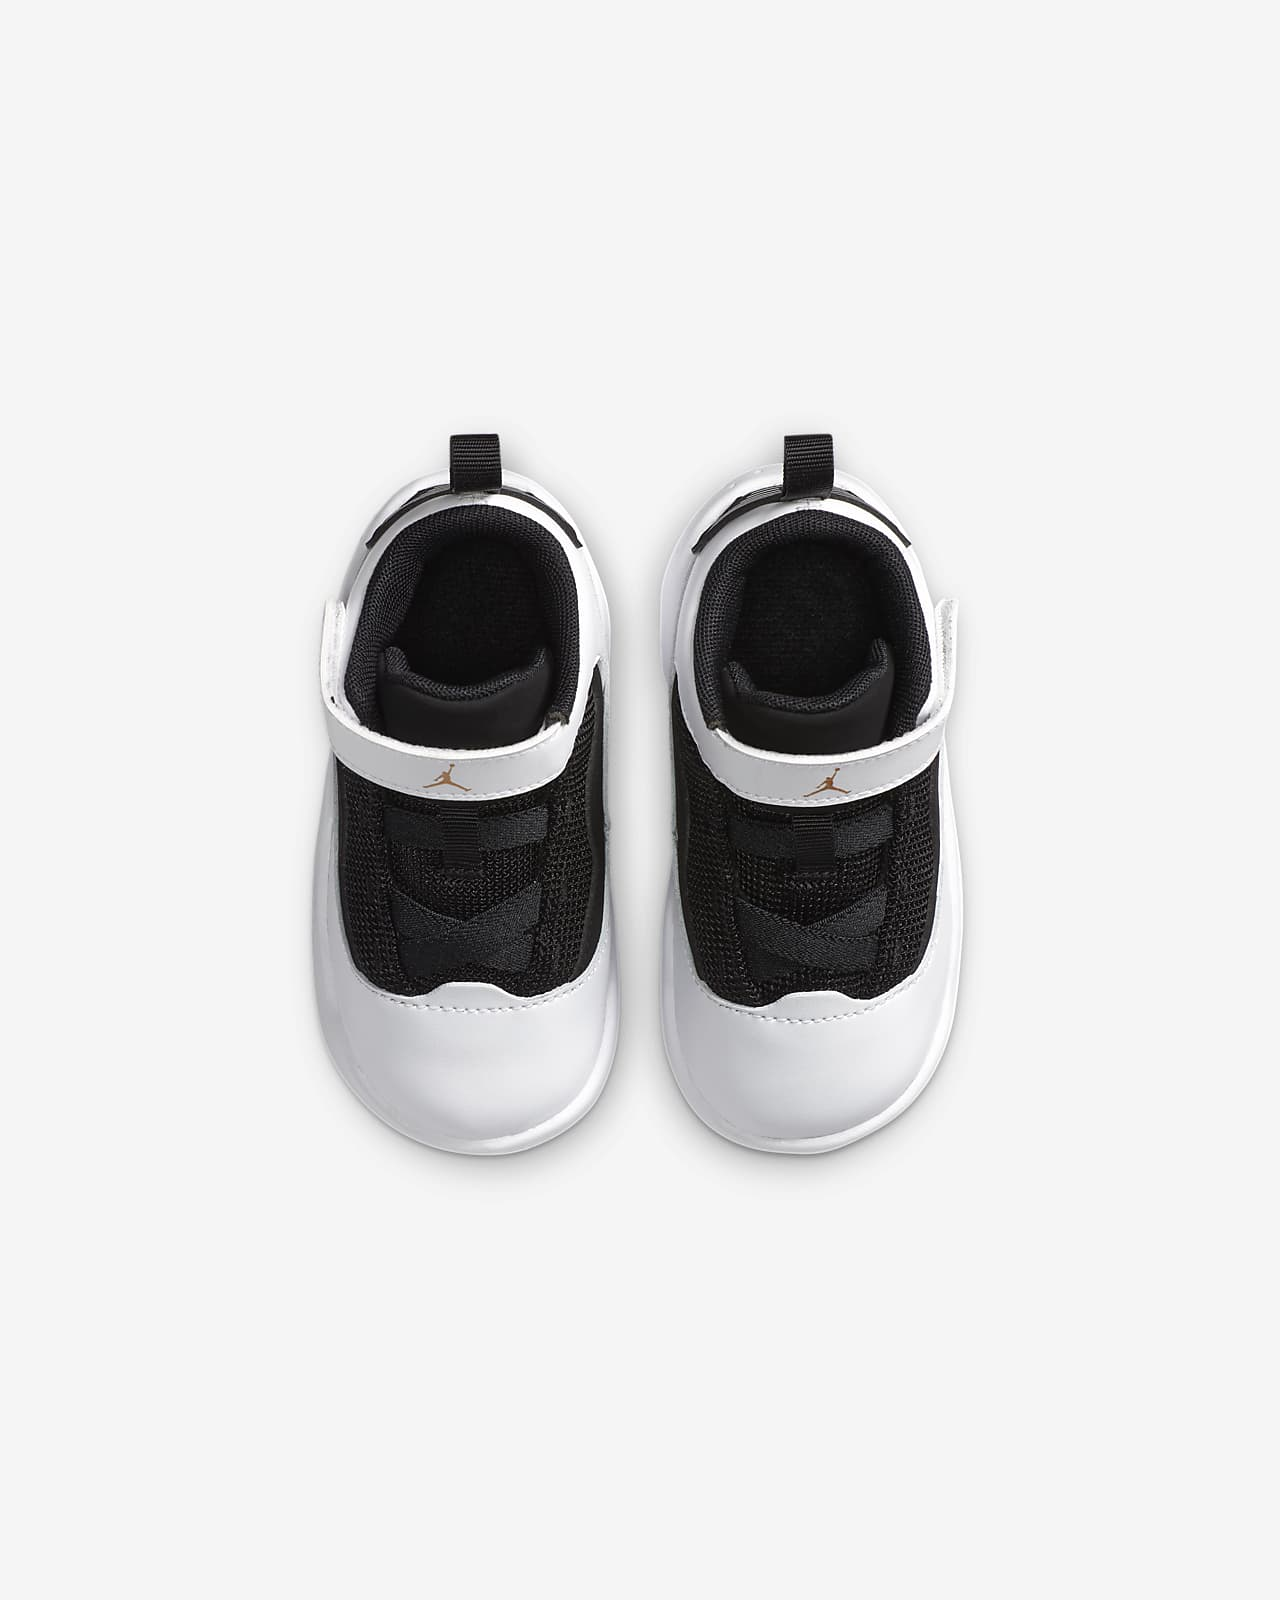 Jordan Max Aura 2 Baby and Toddler Shoe